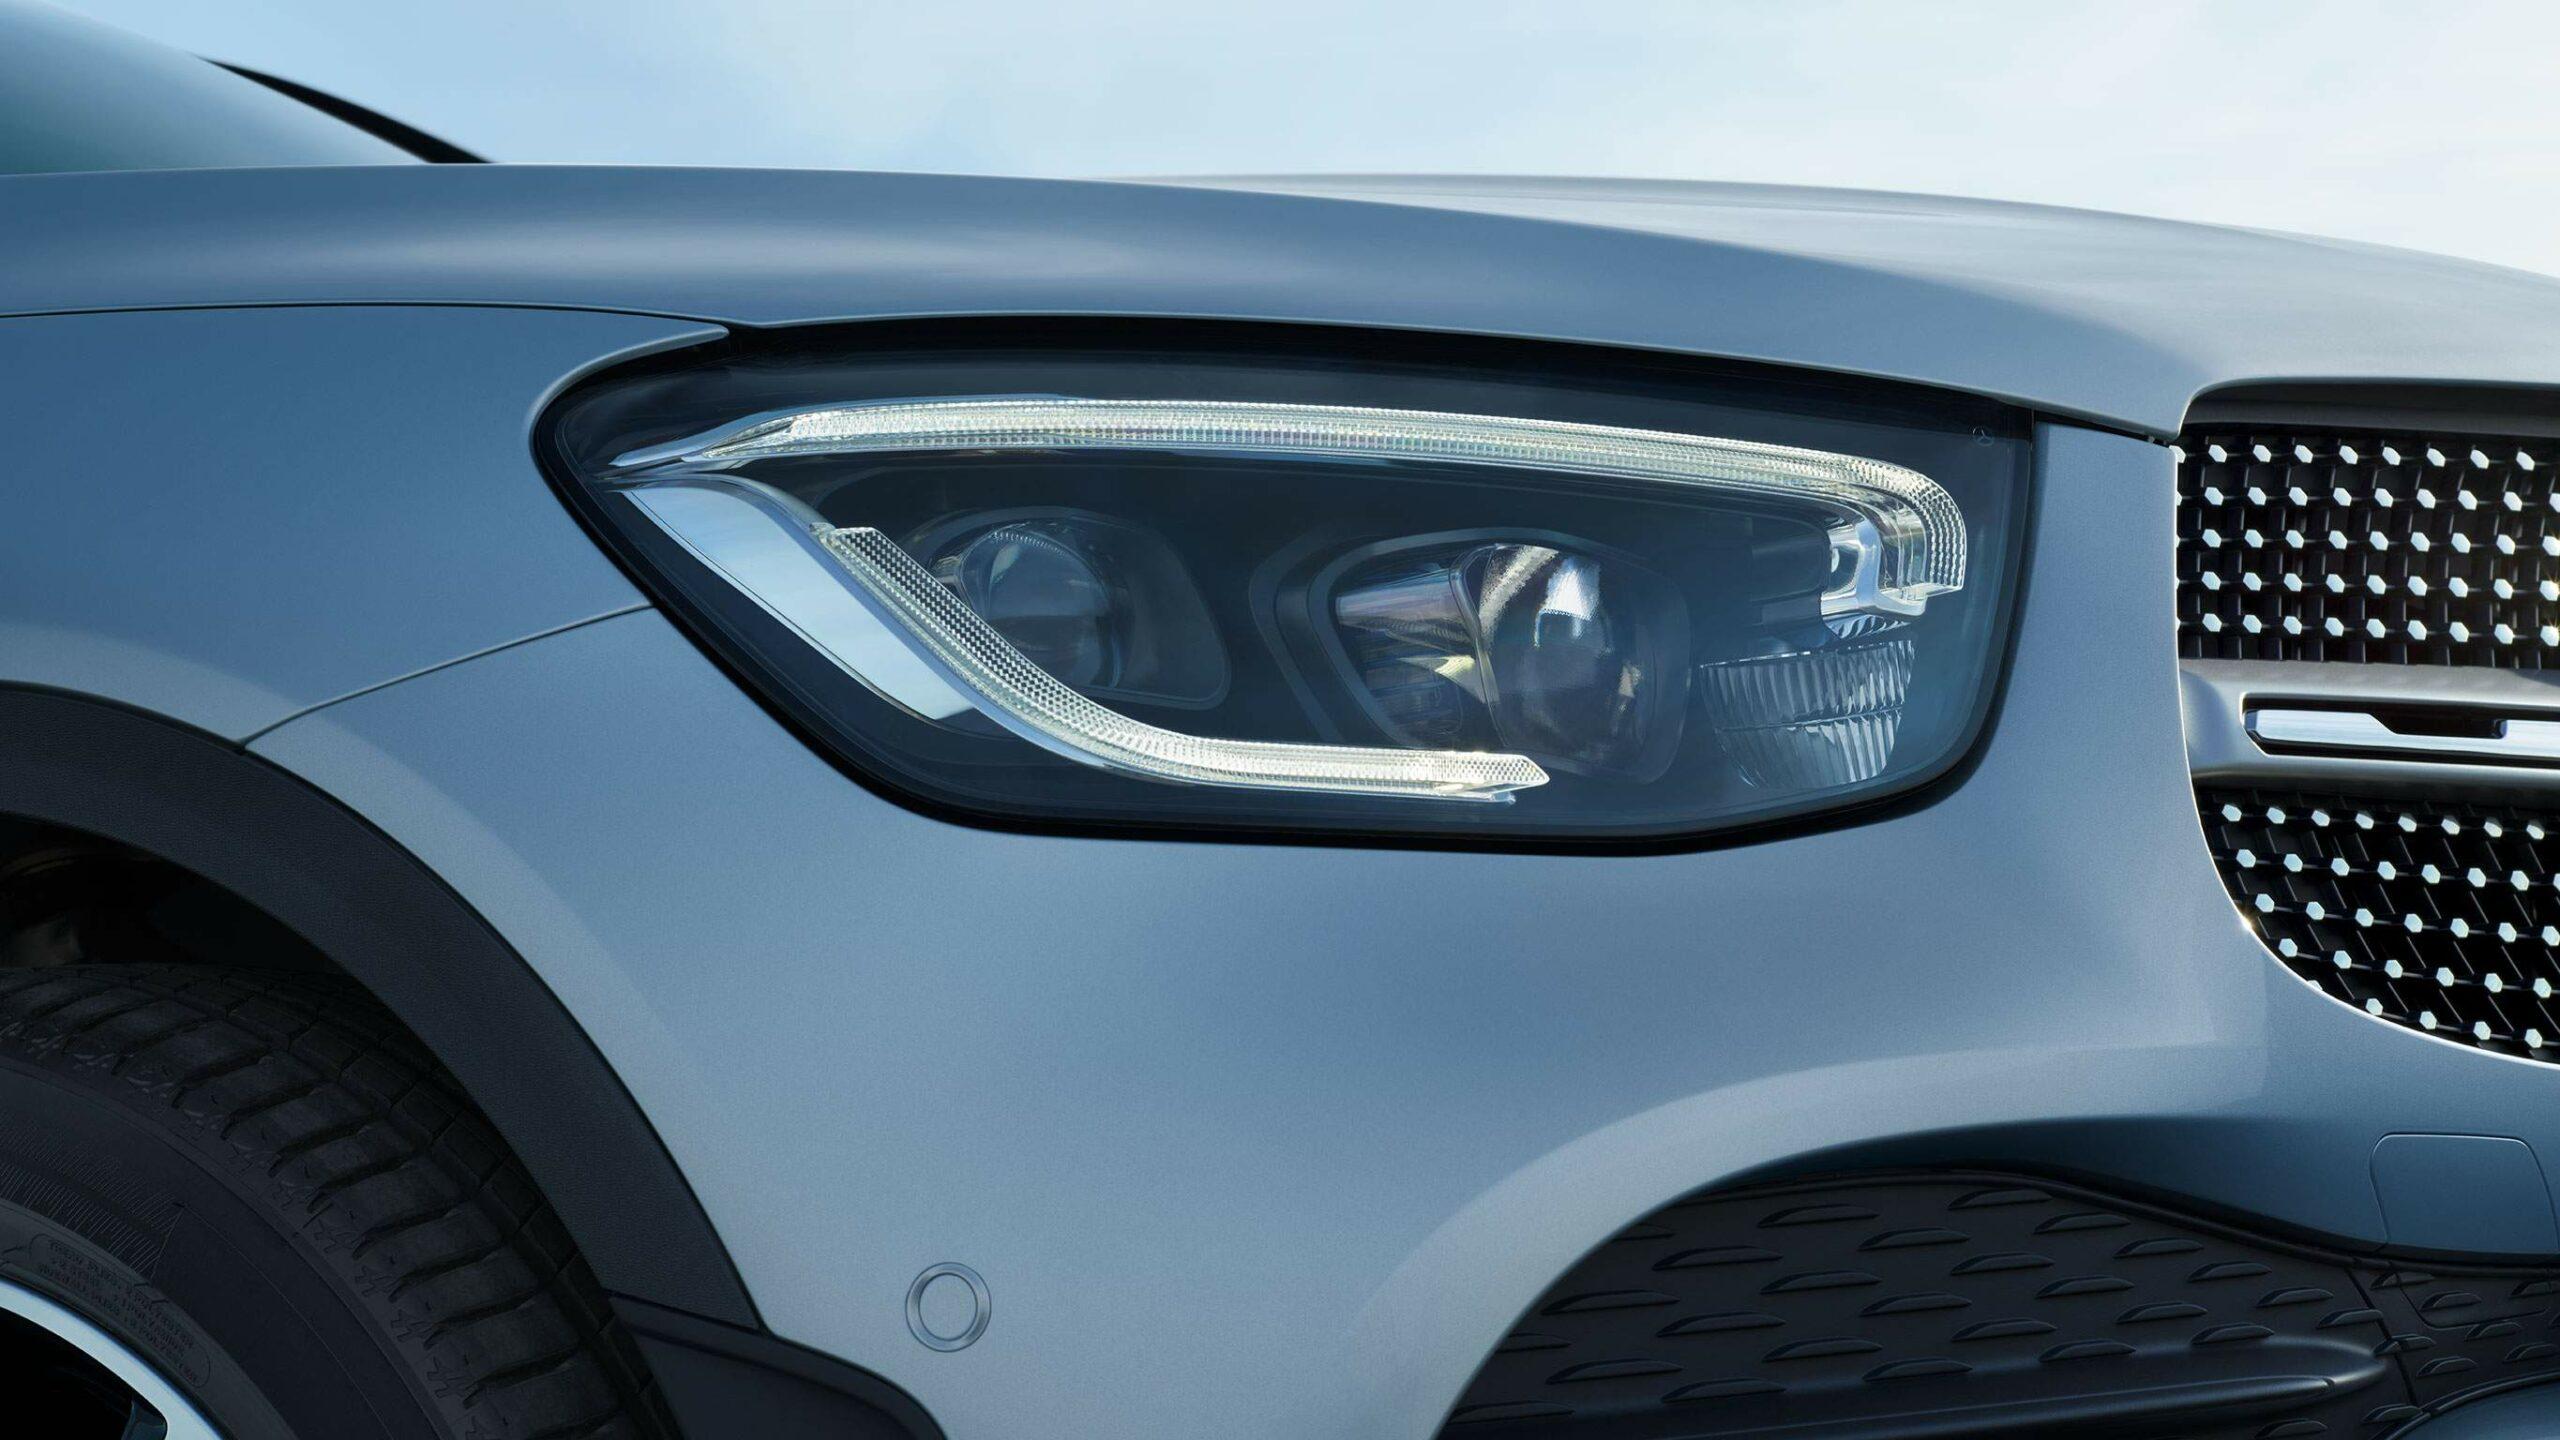 CAR-Avenue-Mercedes-Benz-GLC-Coupe-SUV-02